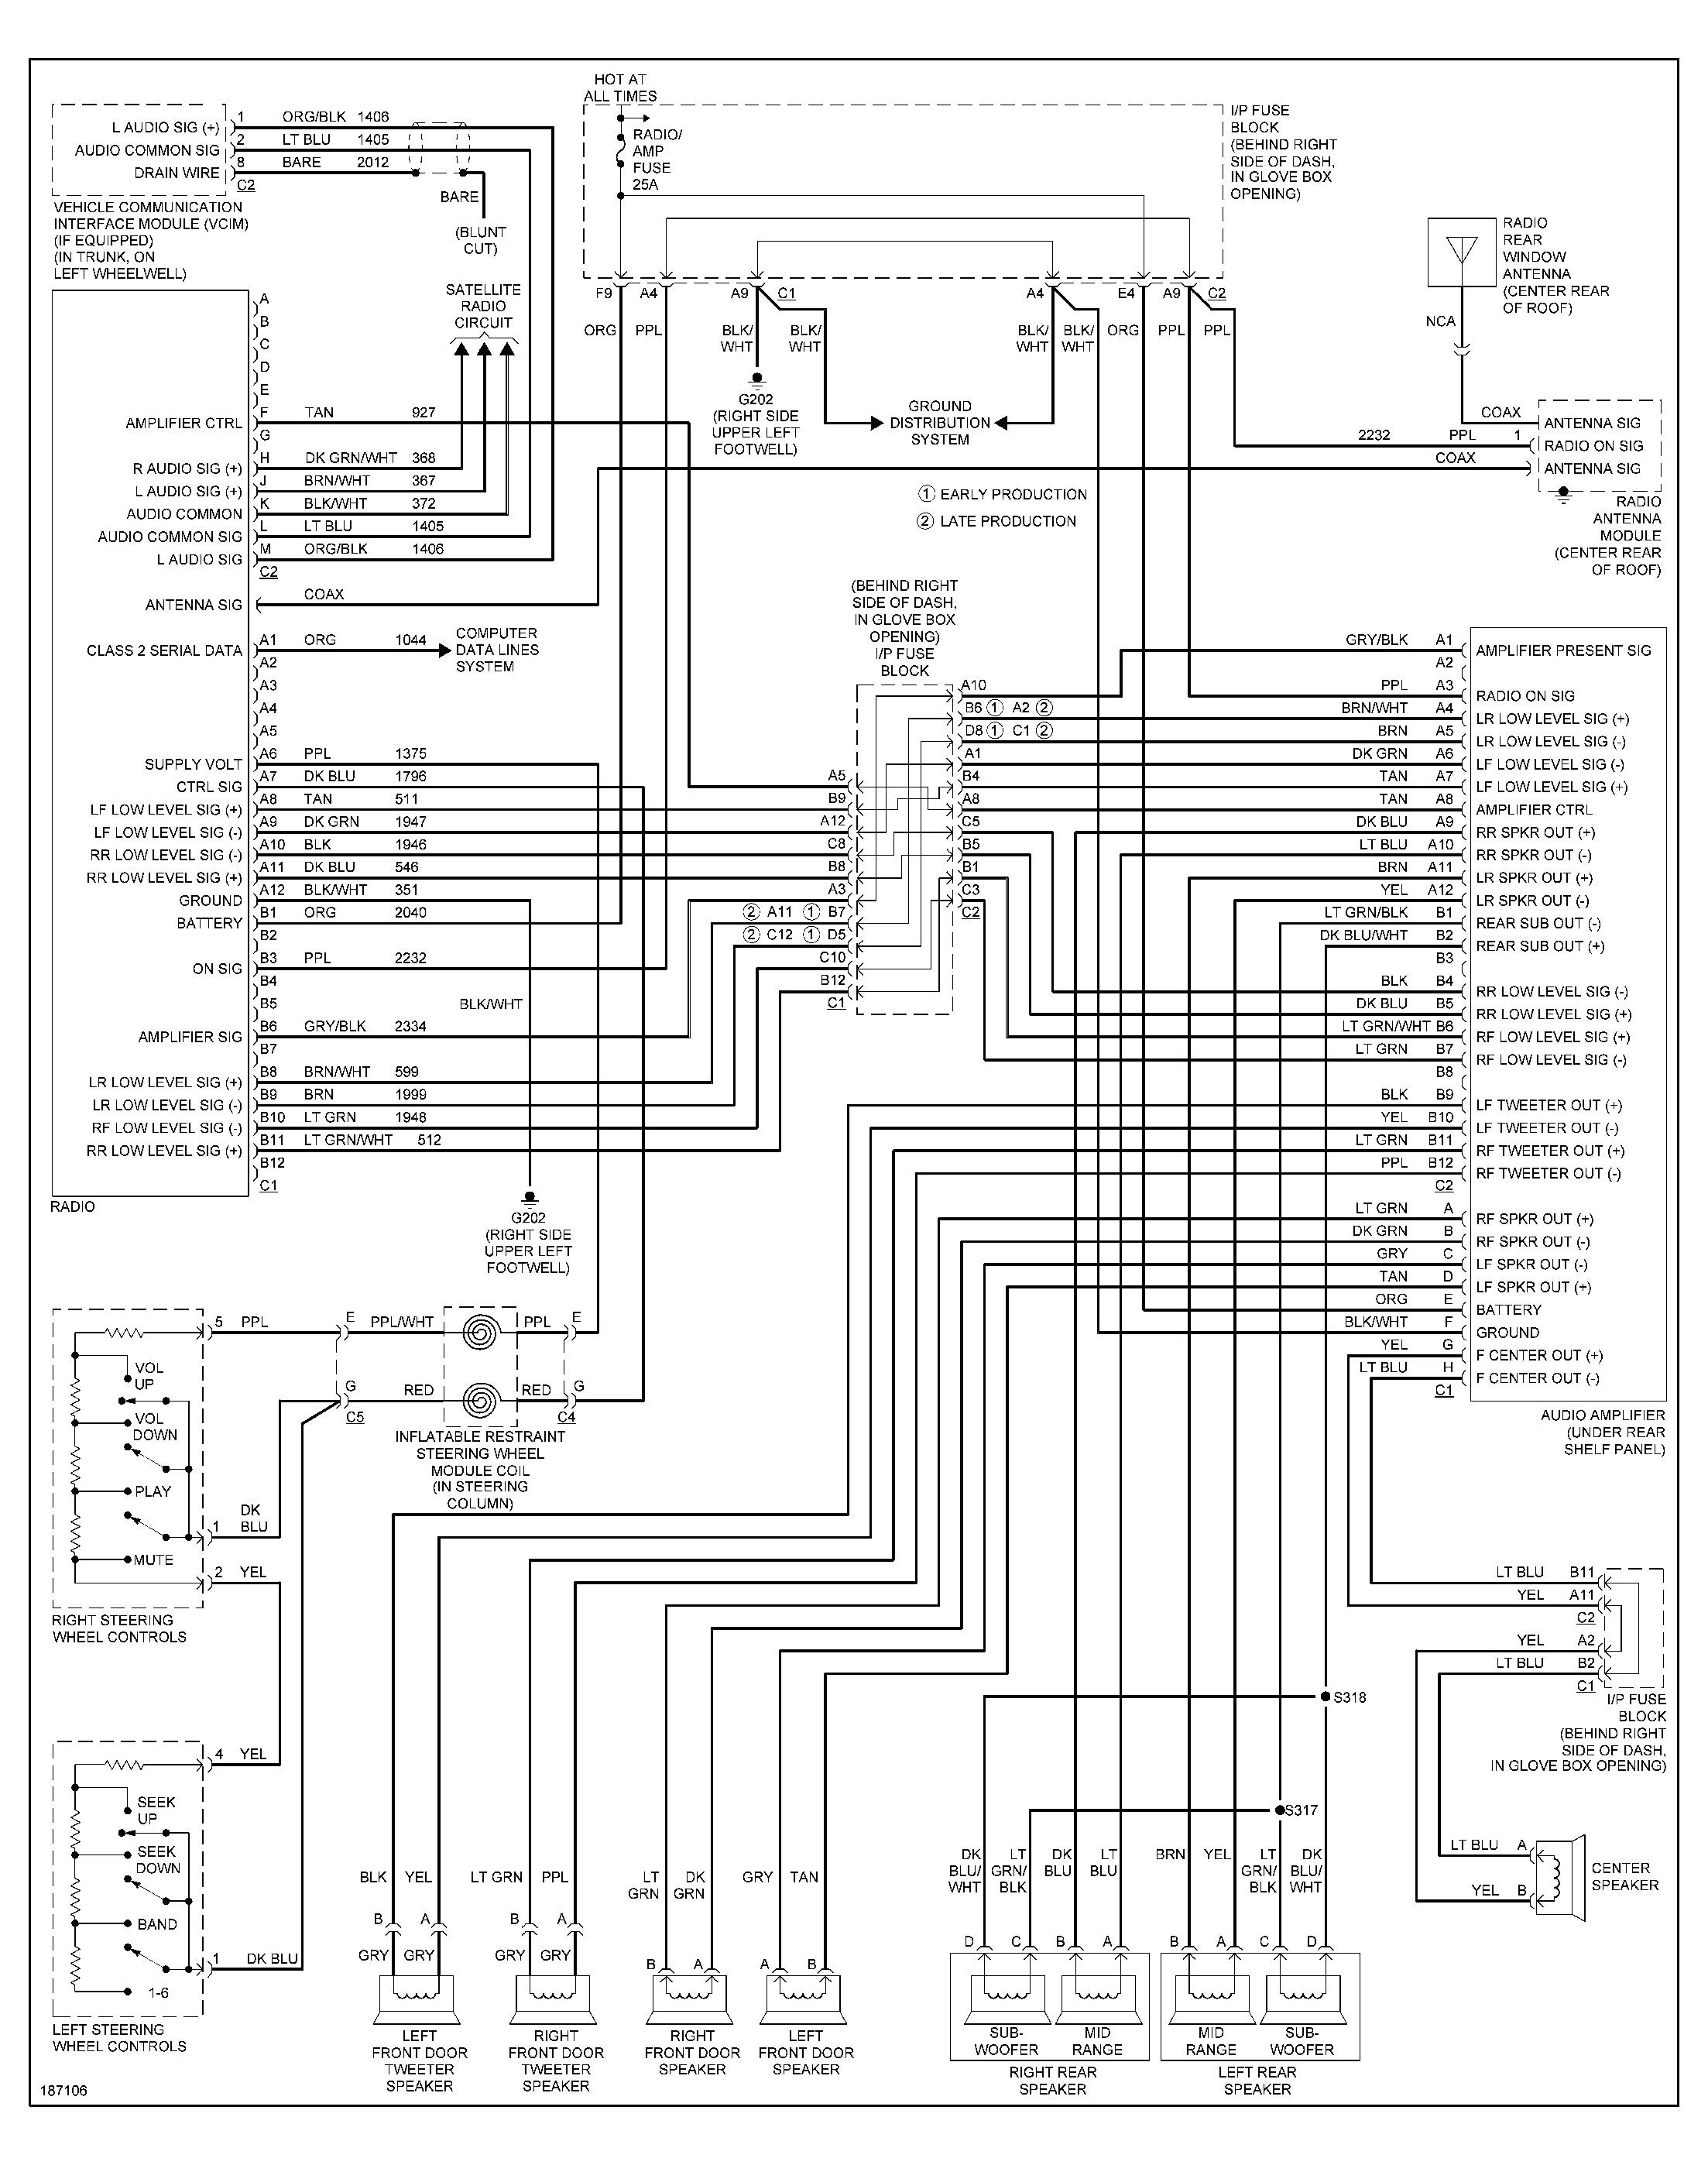 2006 Grand Prix Monsoon Wiring Diagram Grand Prix Wiring Diagrams Wiring Diagram Page